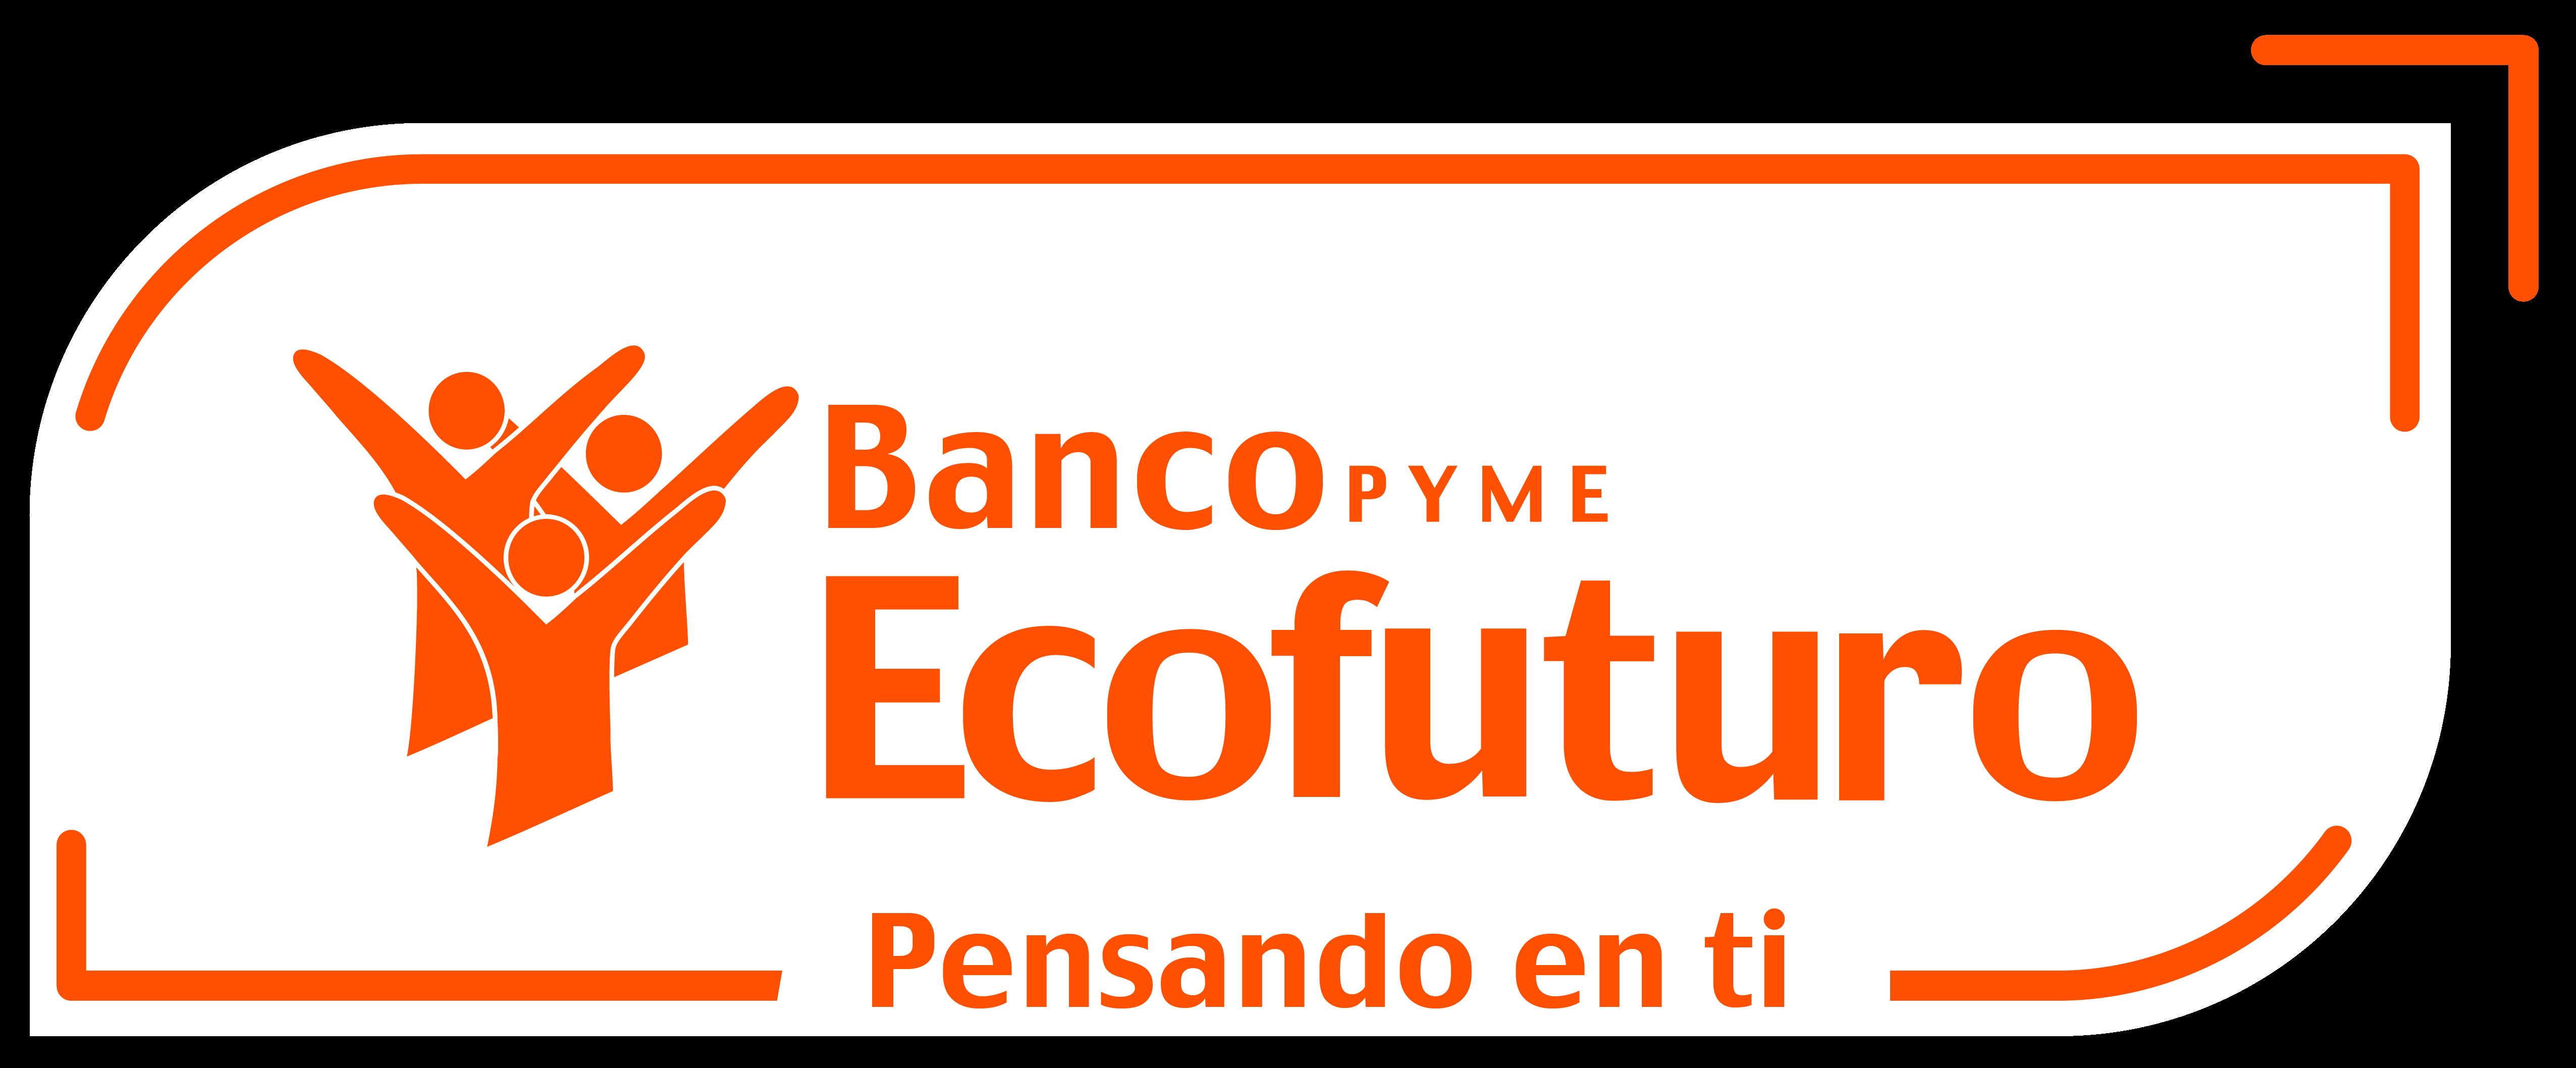 Banco PYME